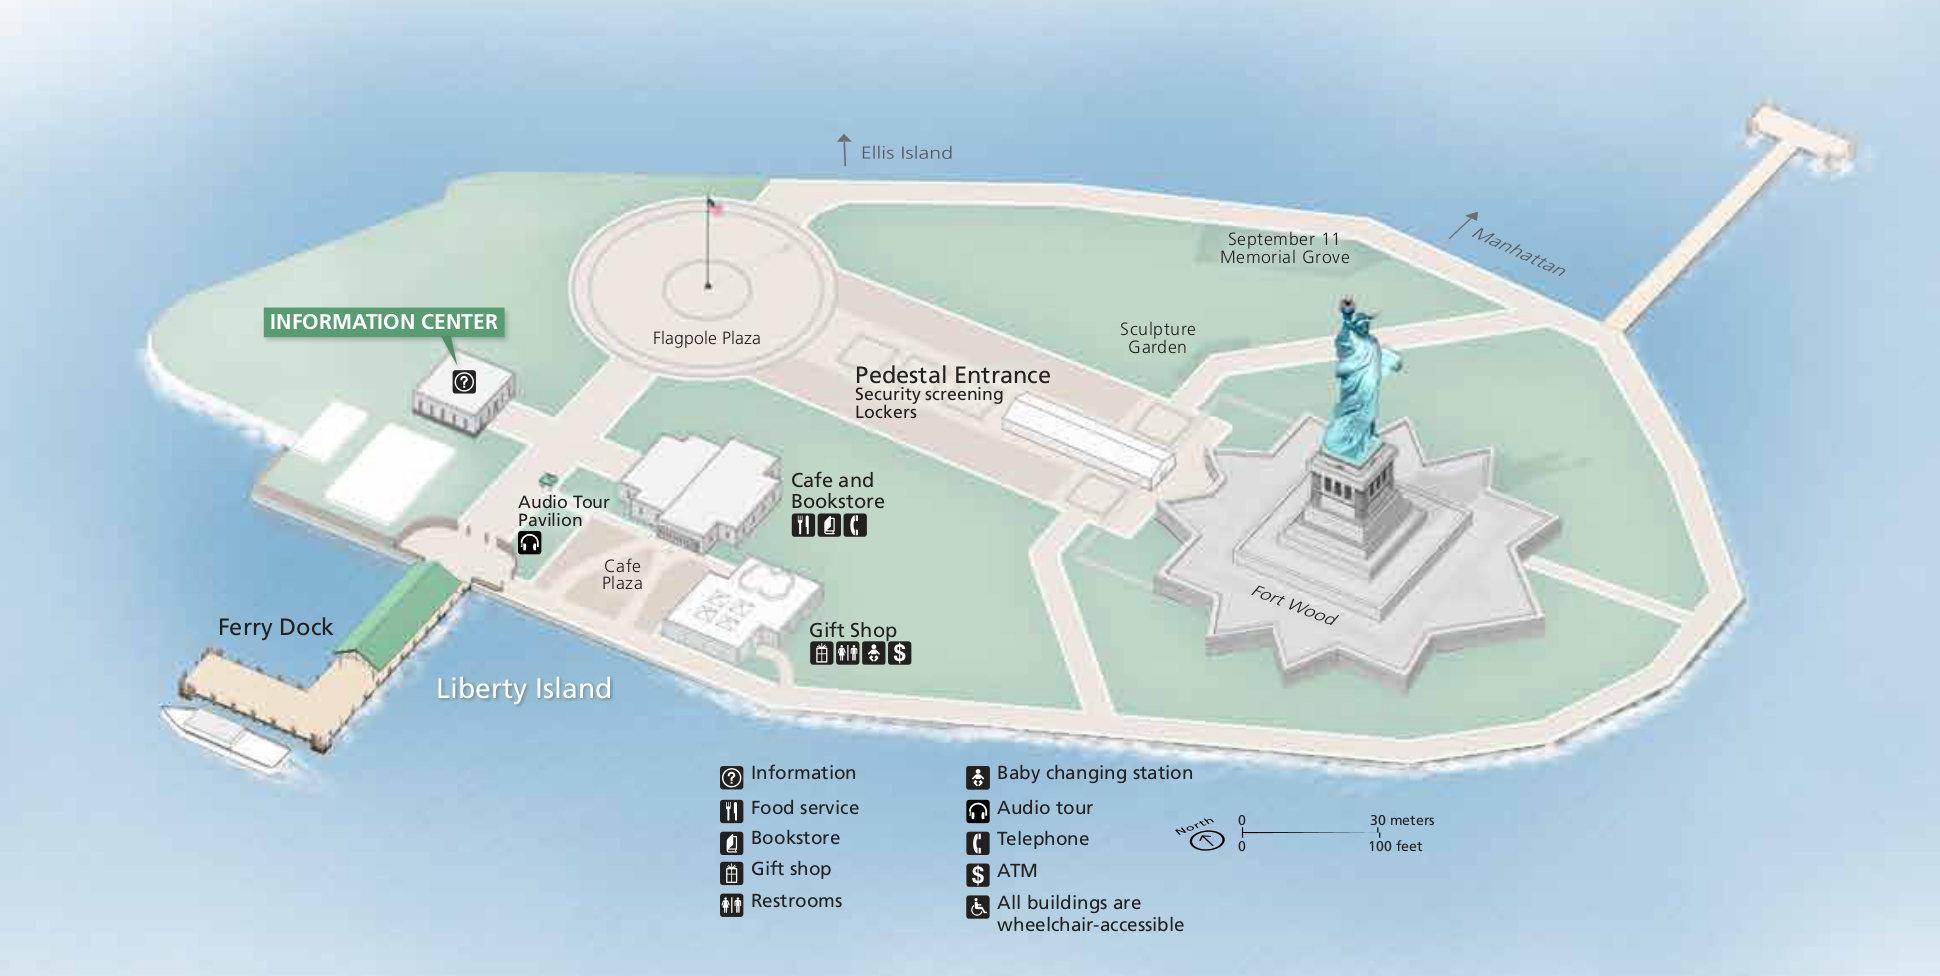 Statue Of Liberty Kort Kort Af Statue Of Liberty New York Usa